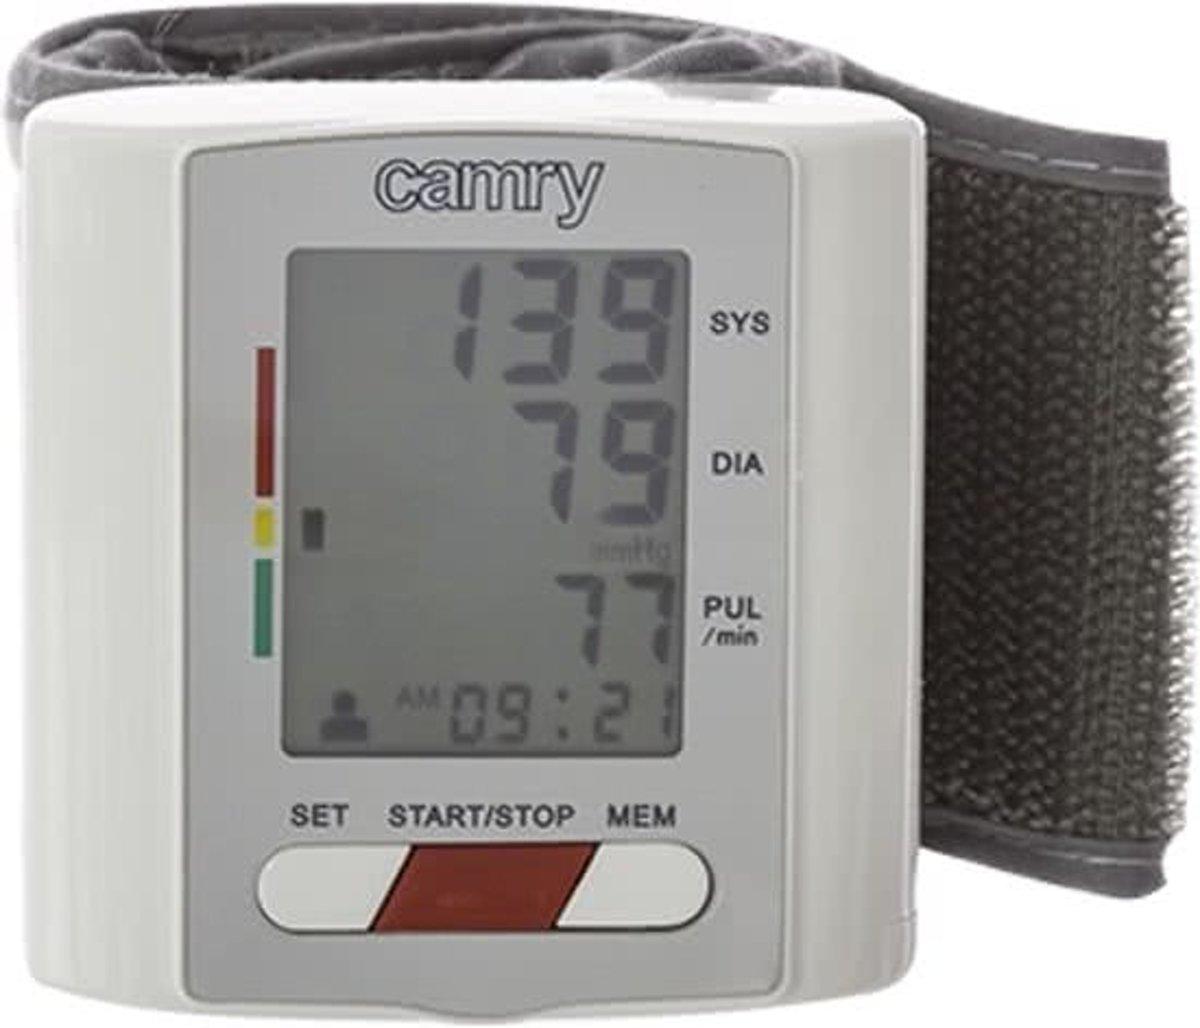 Camry CR 8408 Pols Bloeddrukmeter / Hartslagmeter